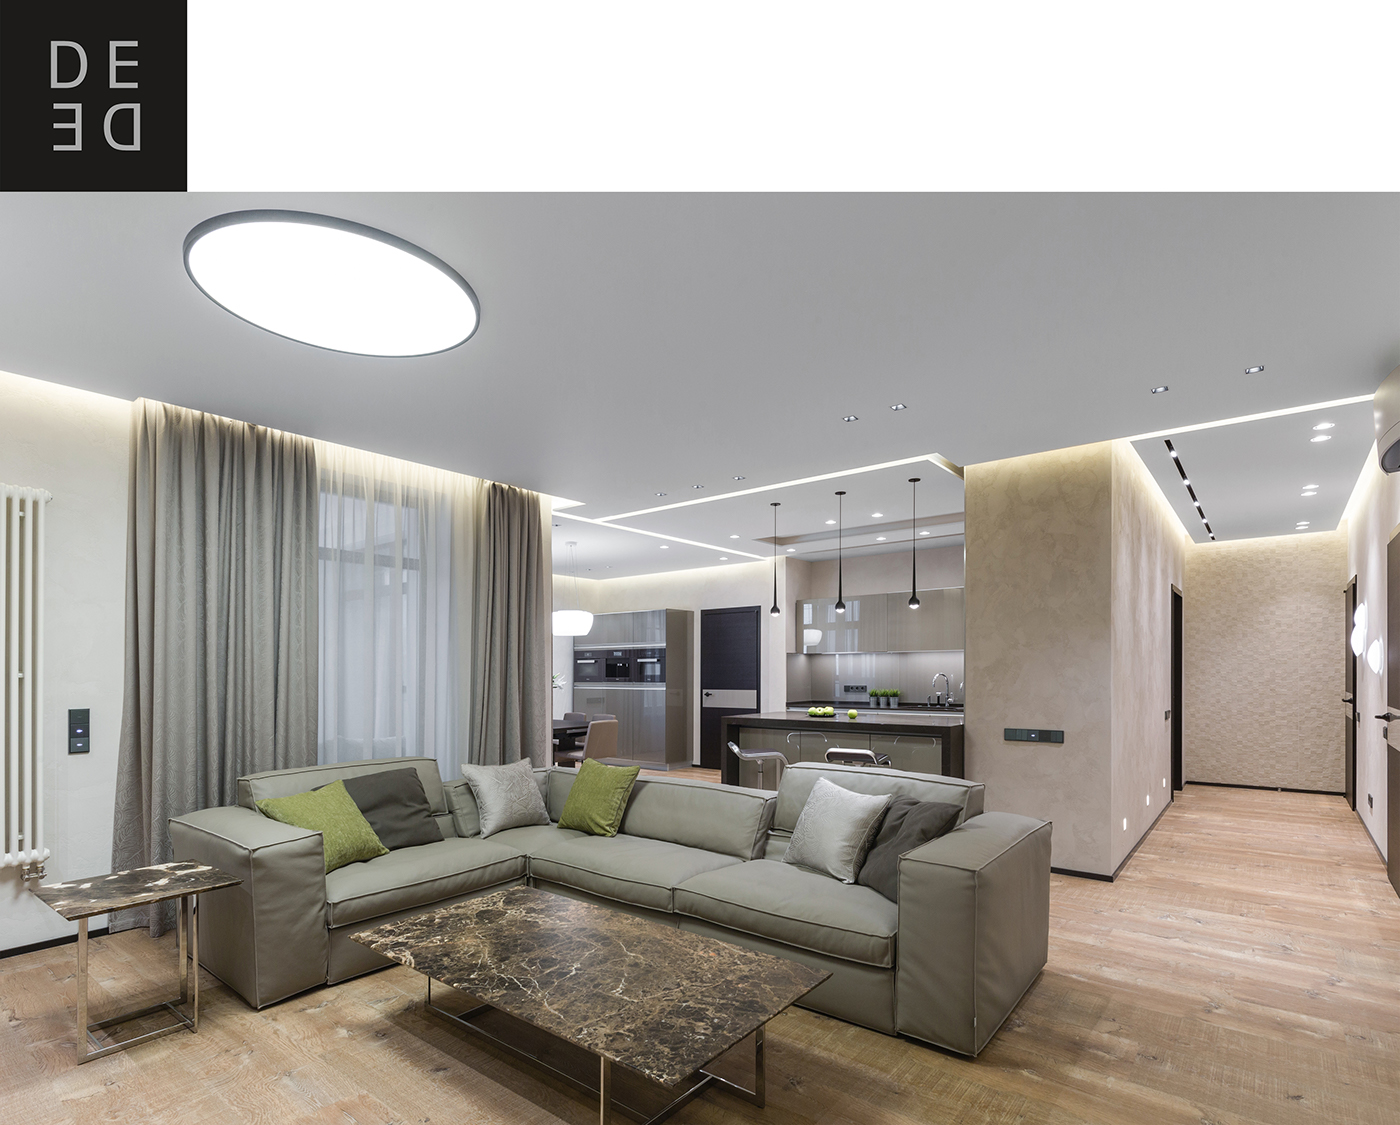 Interior design interior design  Modern Design DE&DE Interior Studio Photography